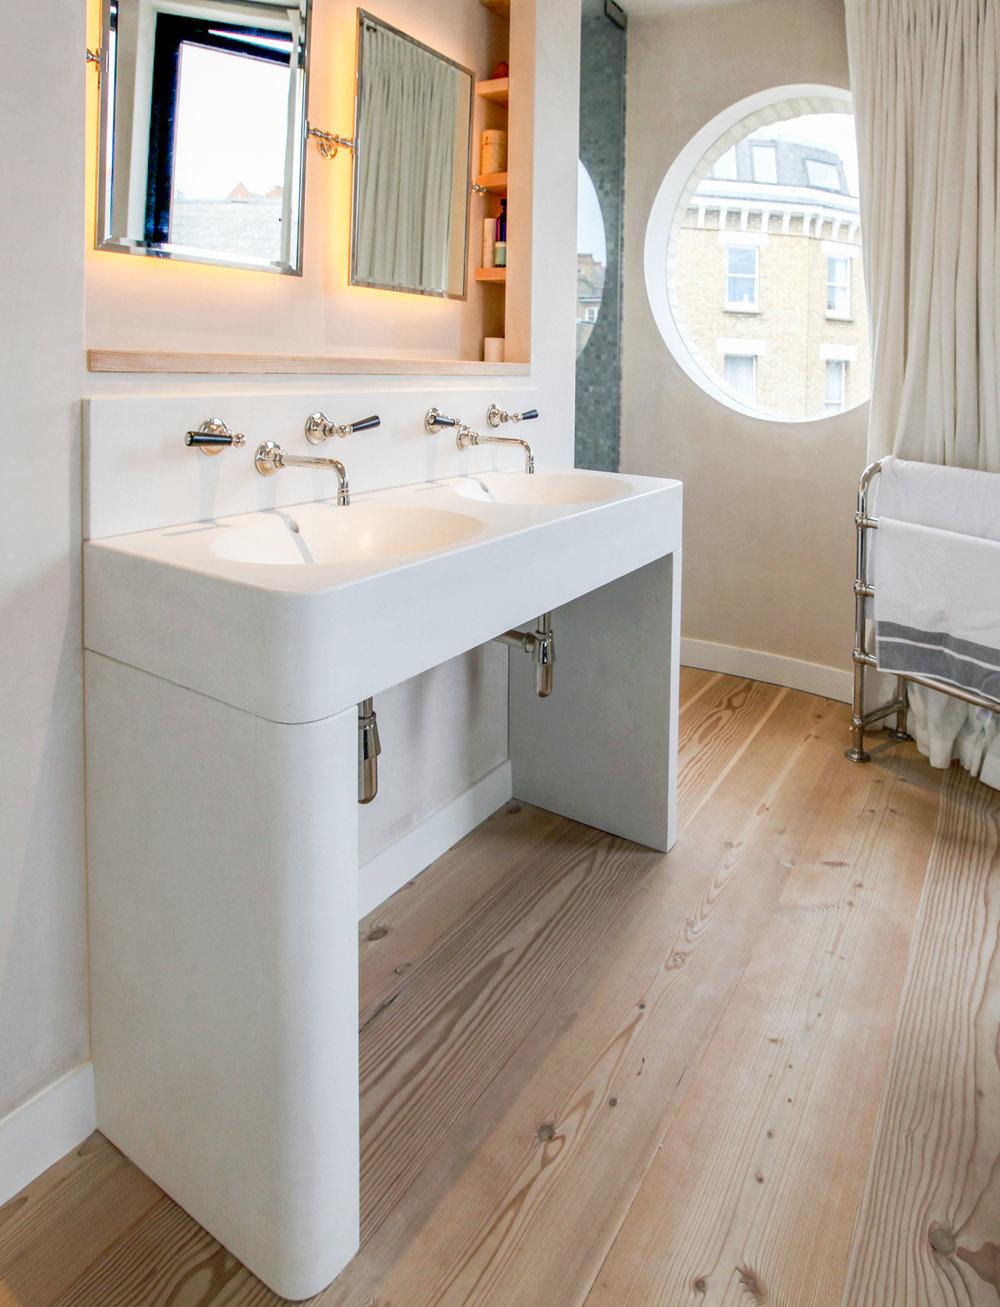 double-white-marble-sink-basin-forma-studios.jpg